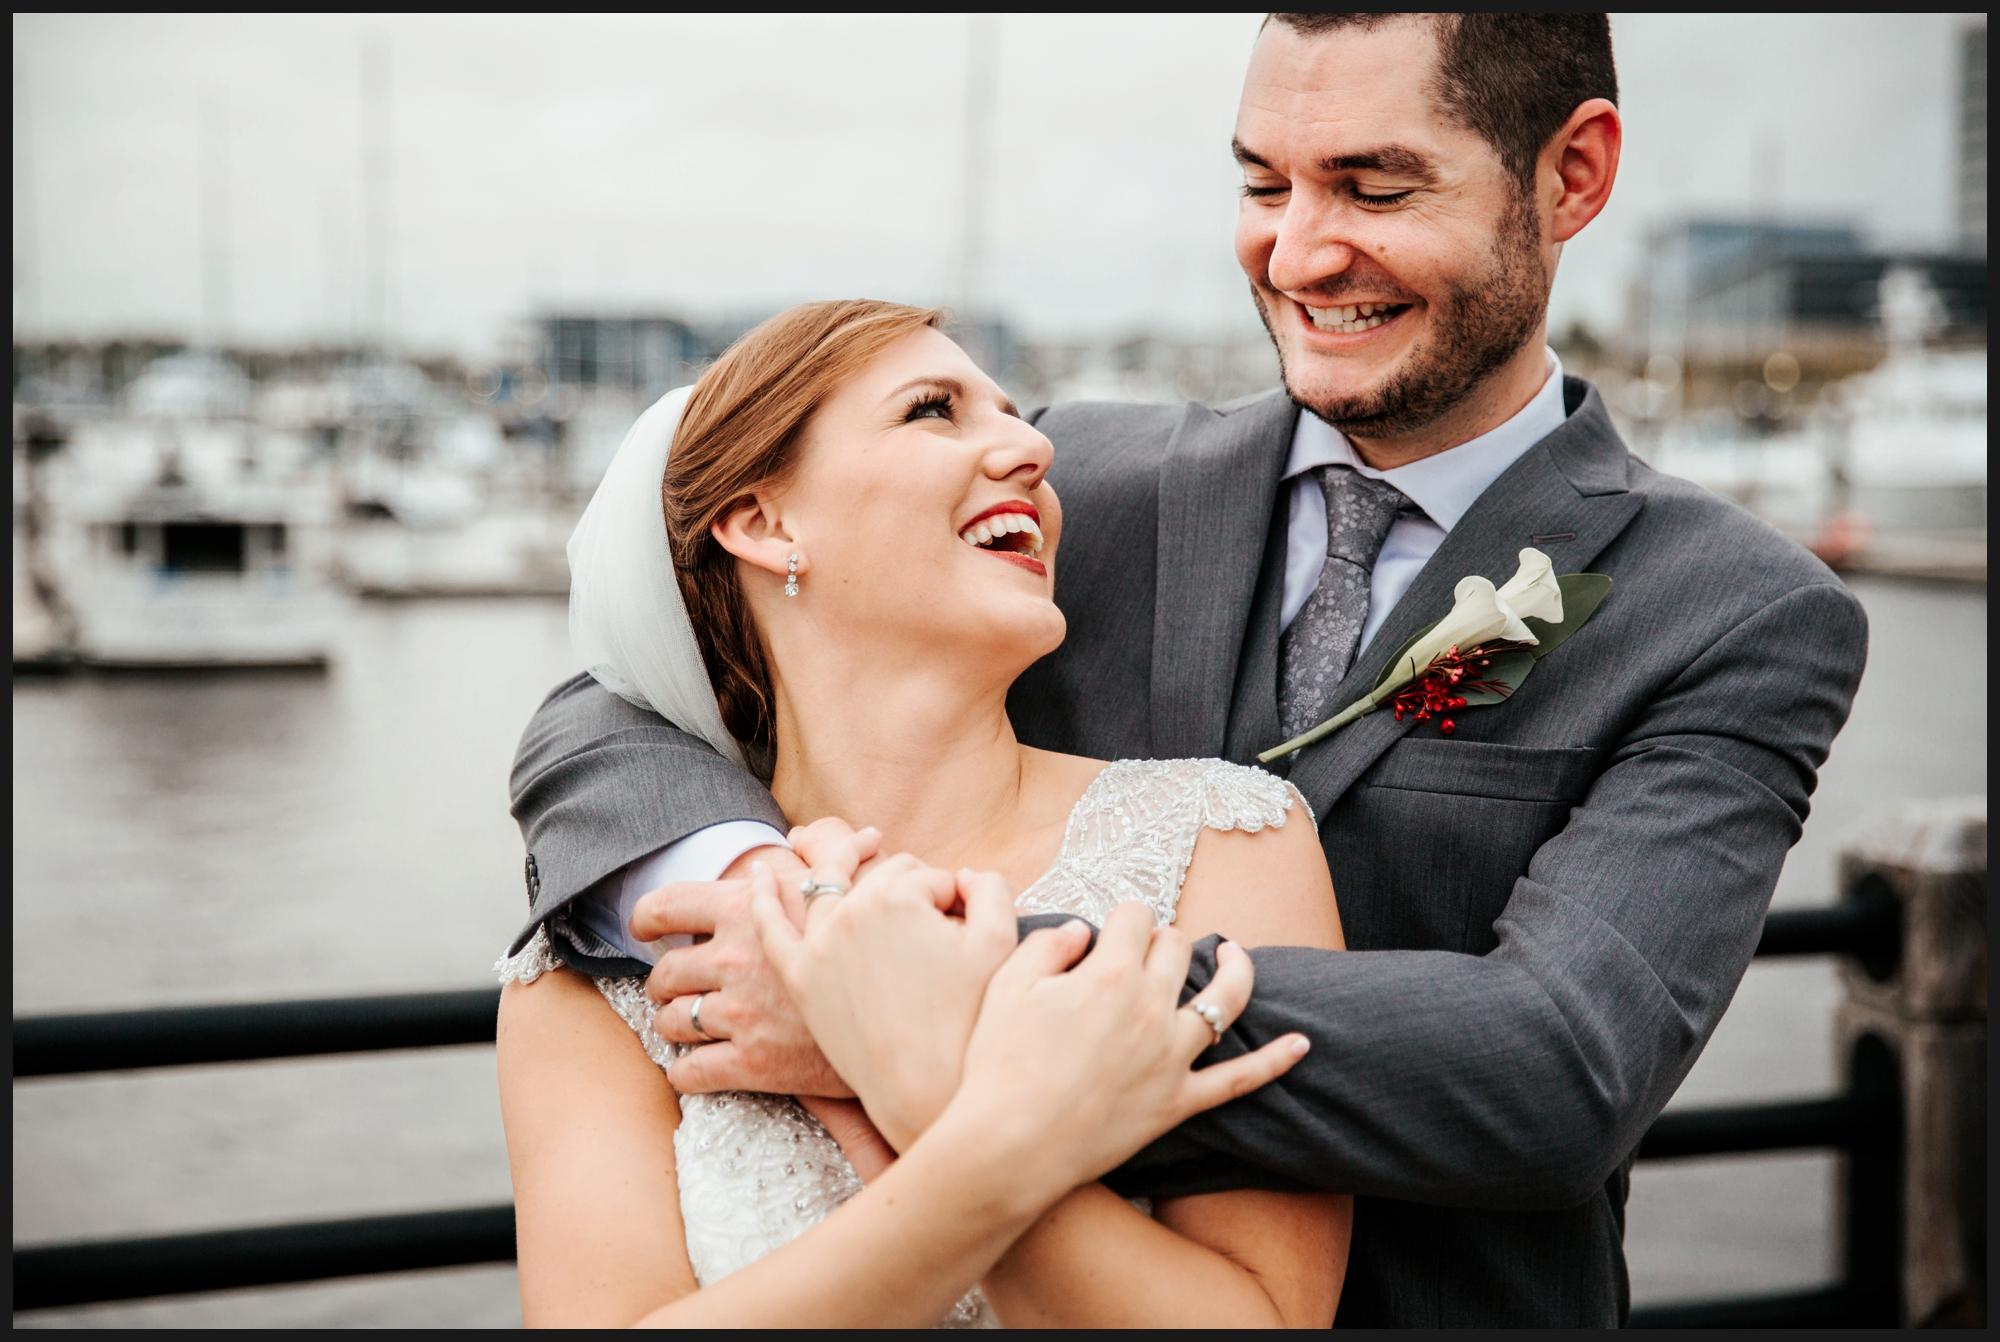 Orlando-Wedding-Photographer-destination-wedding-photographer-florida-wedding-photographer-bohemian-wedding-photographer_0637.jpg